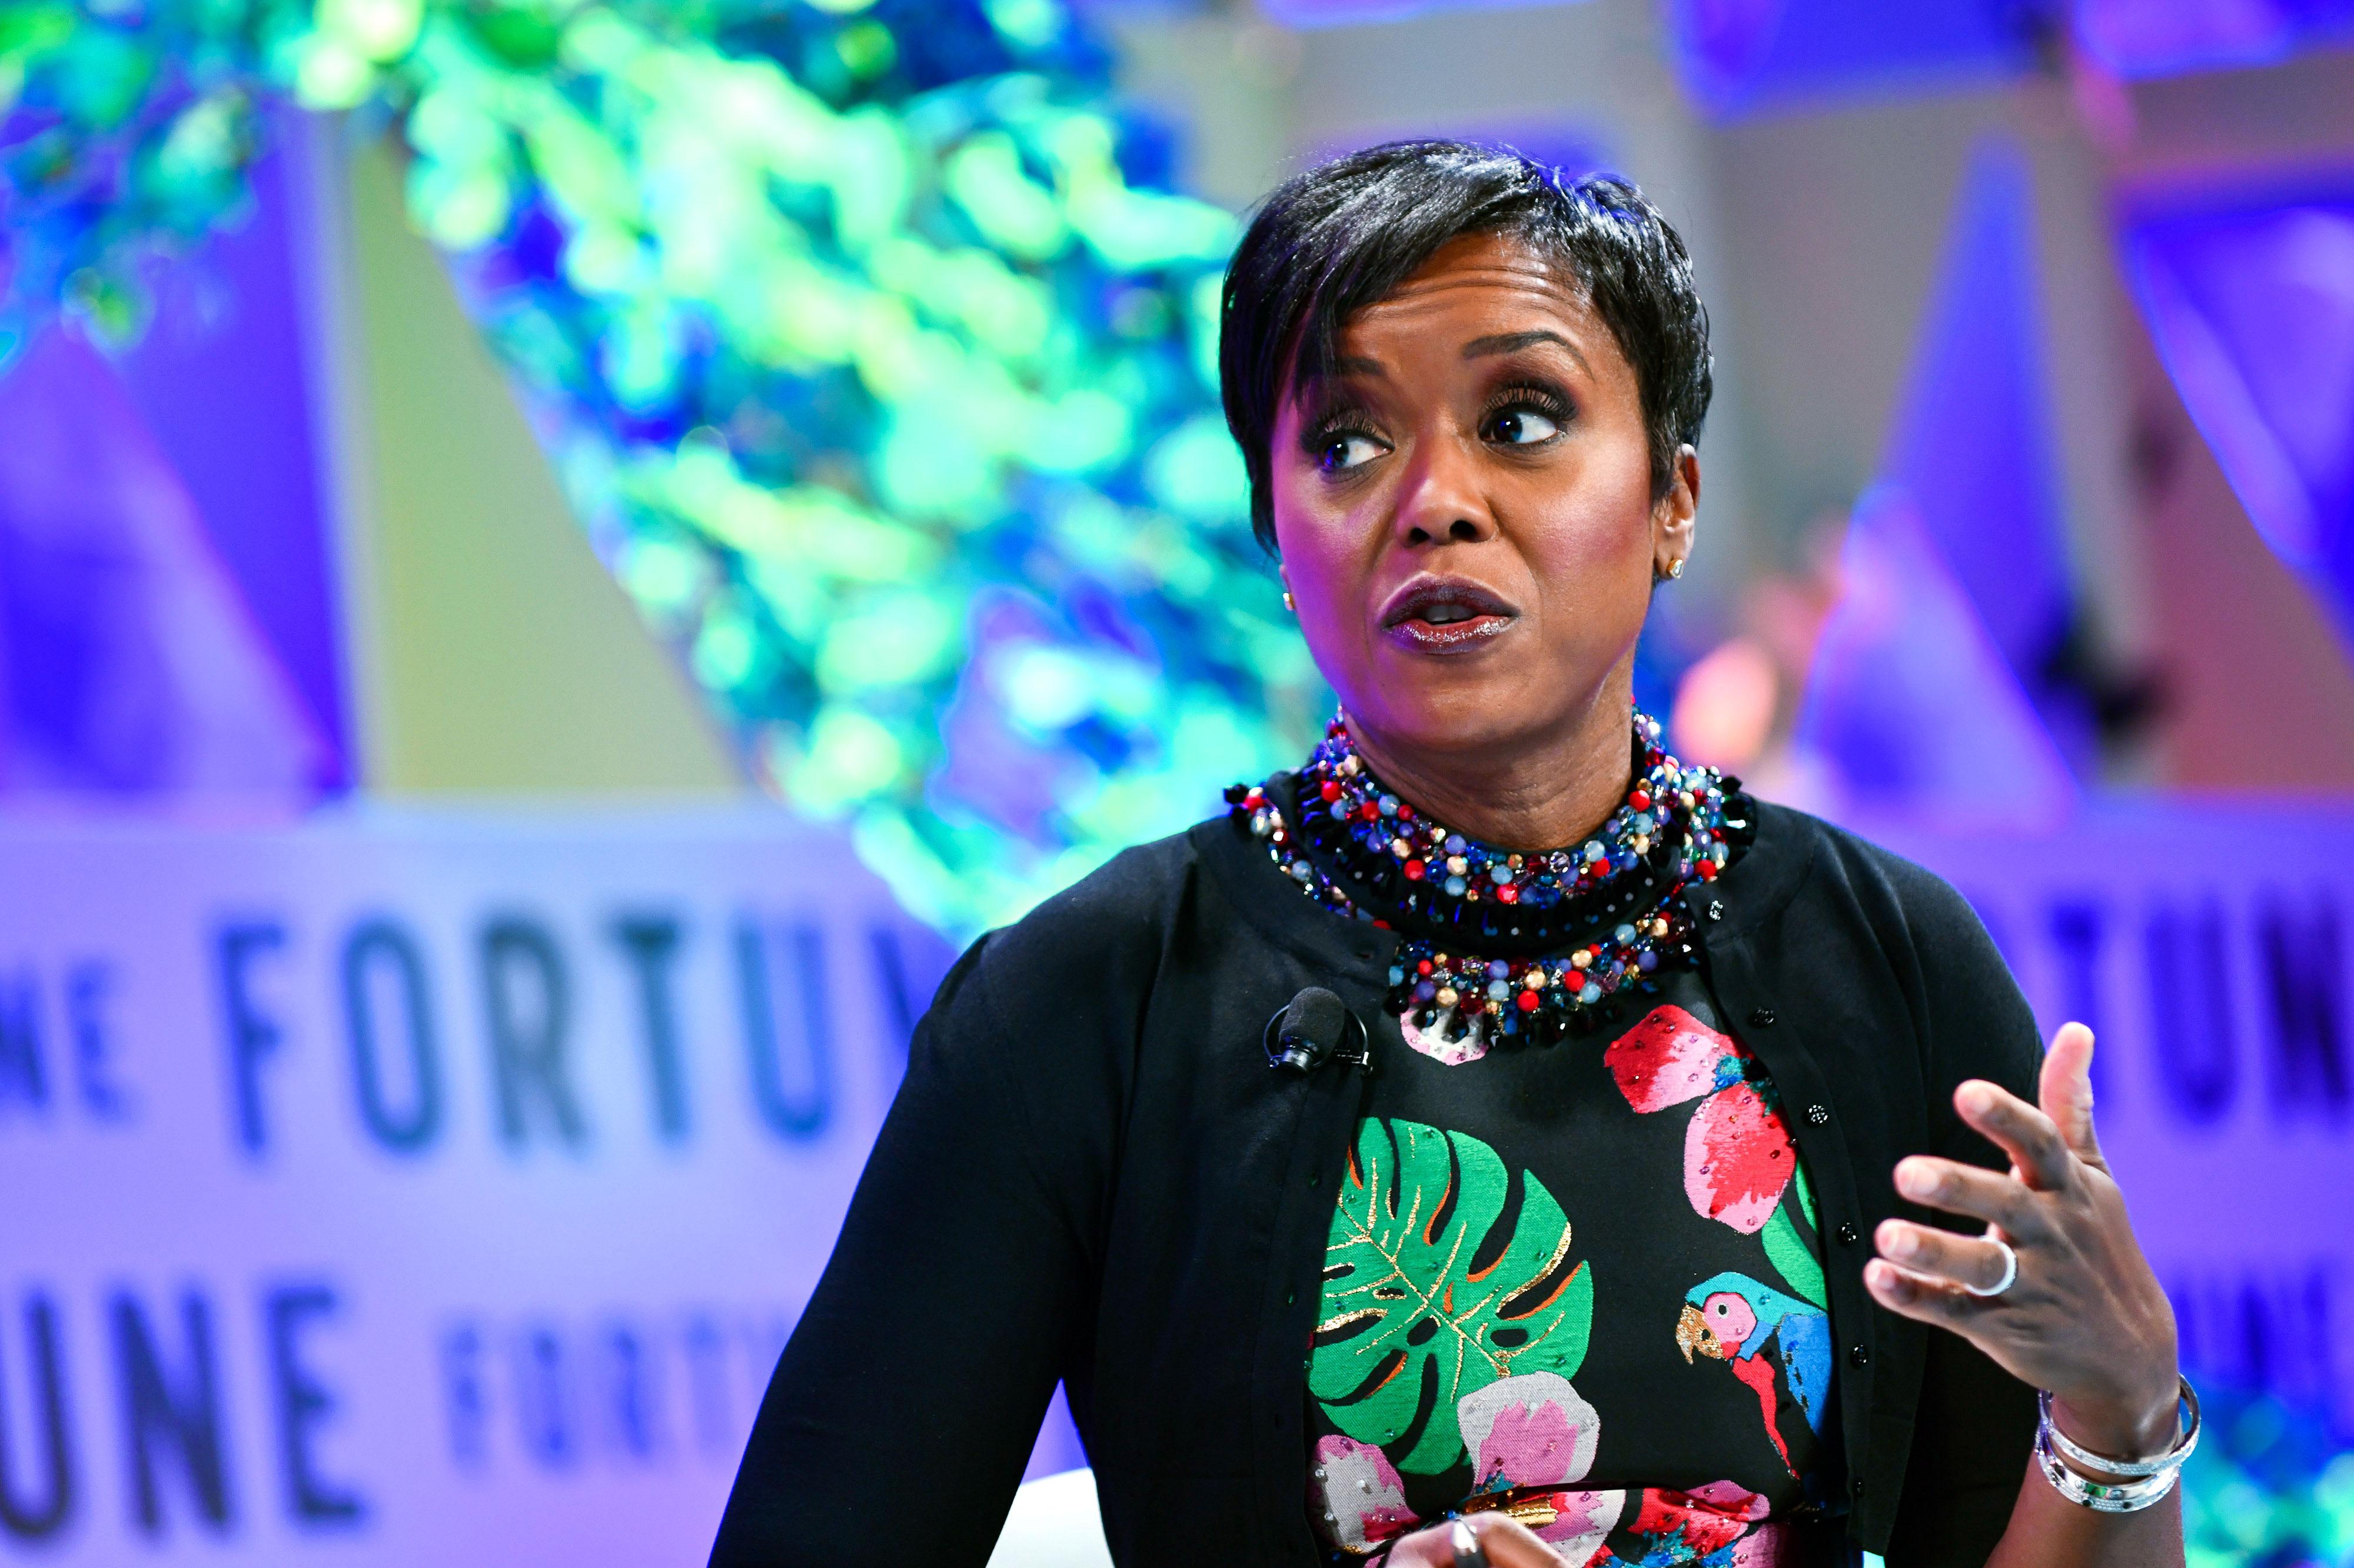 Fortune Most Powerful Women 2017 Summit